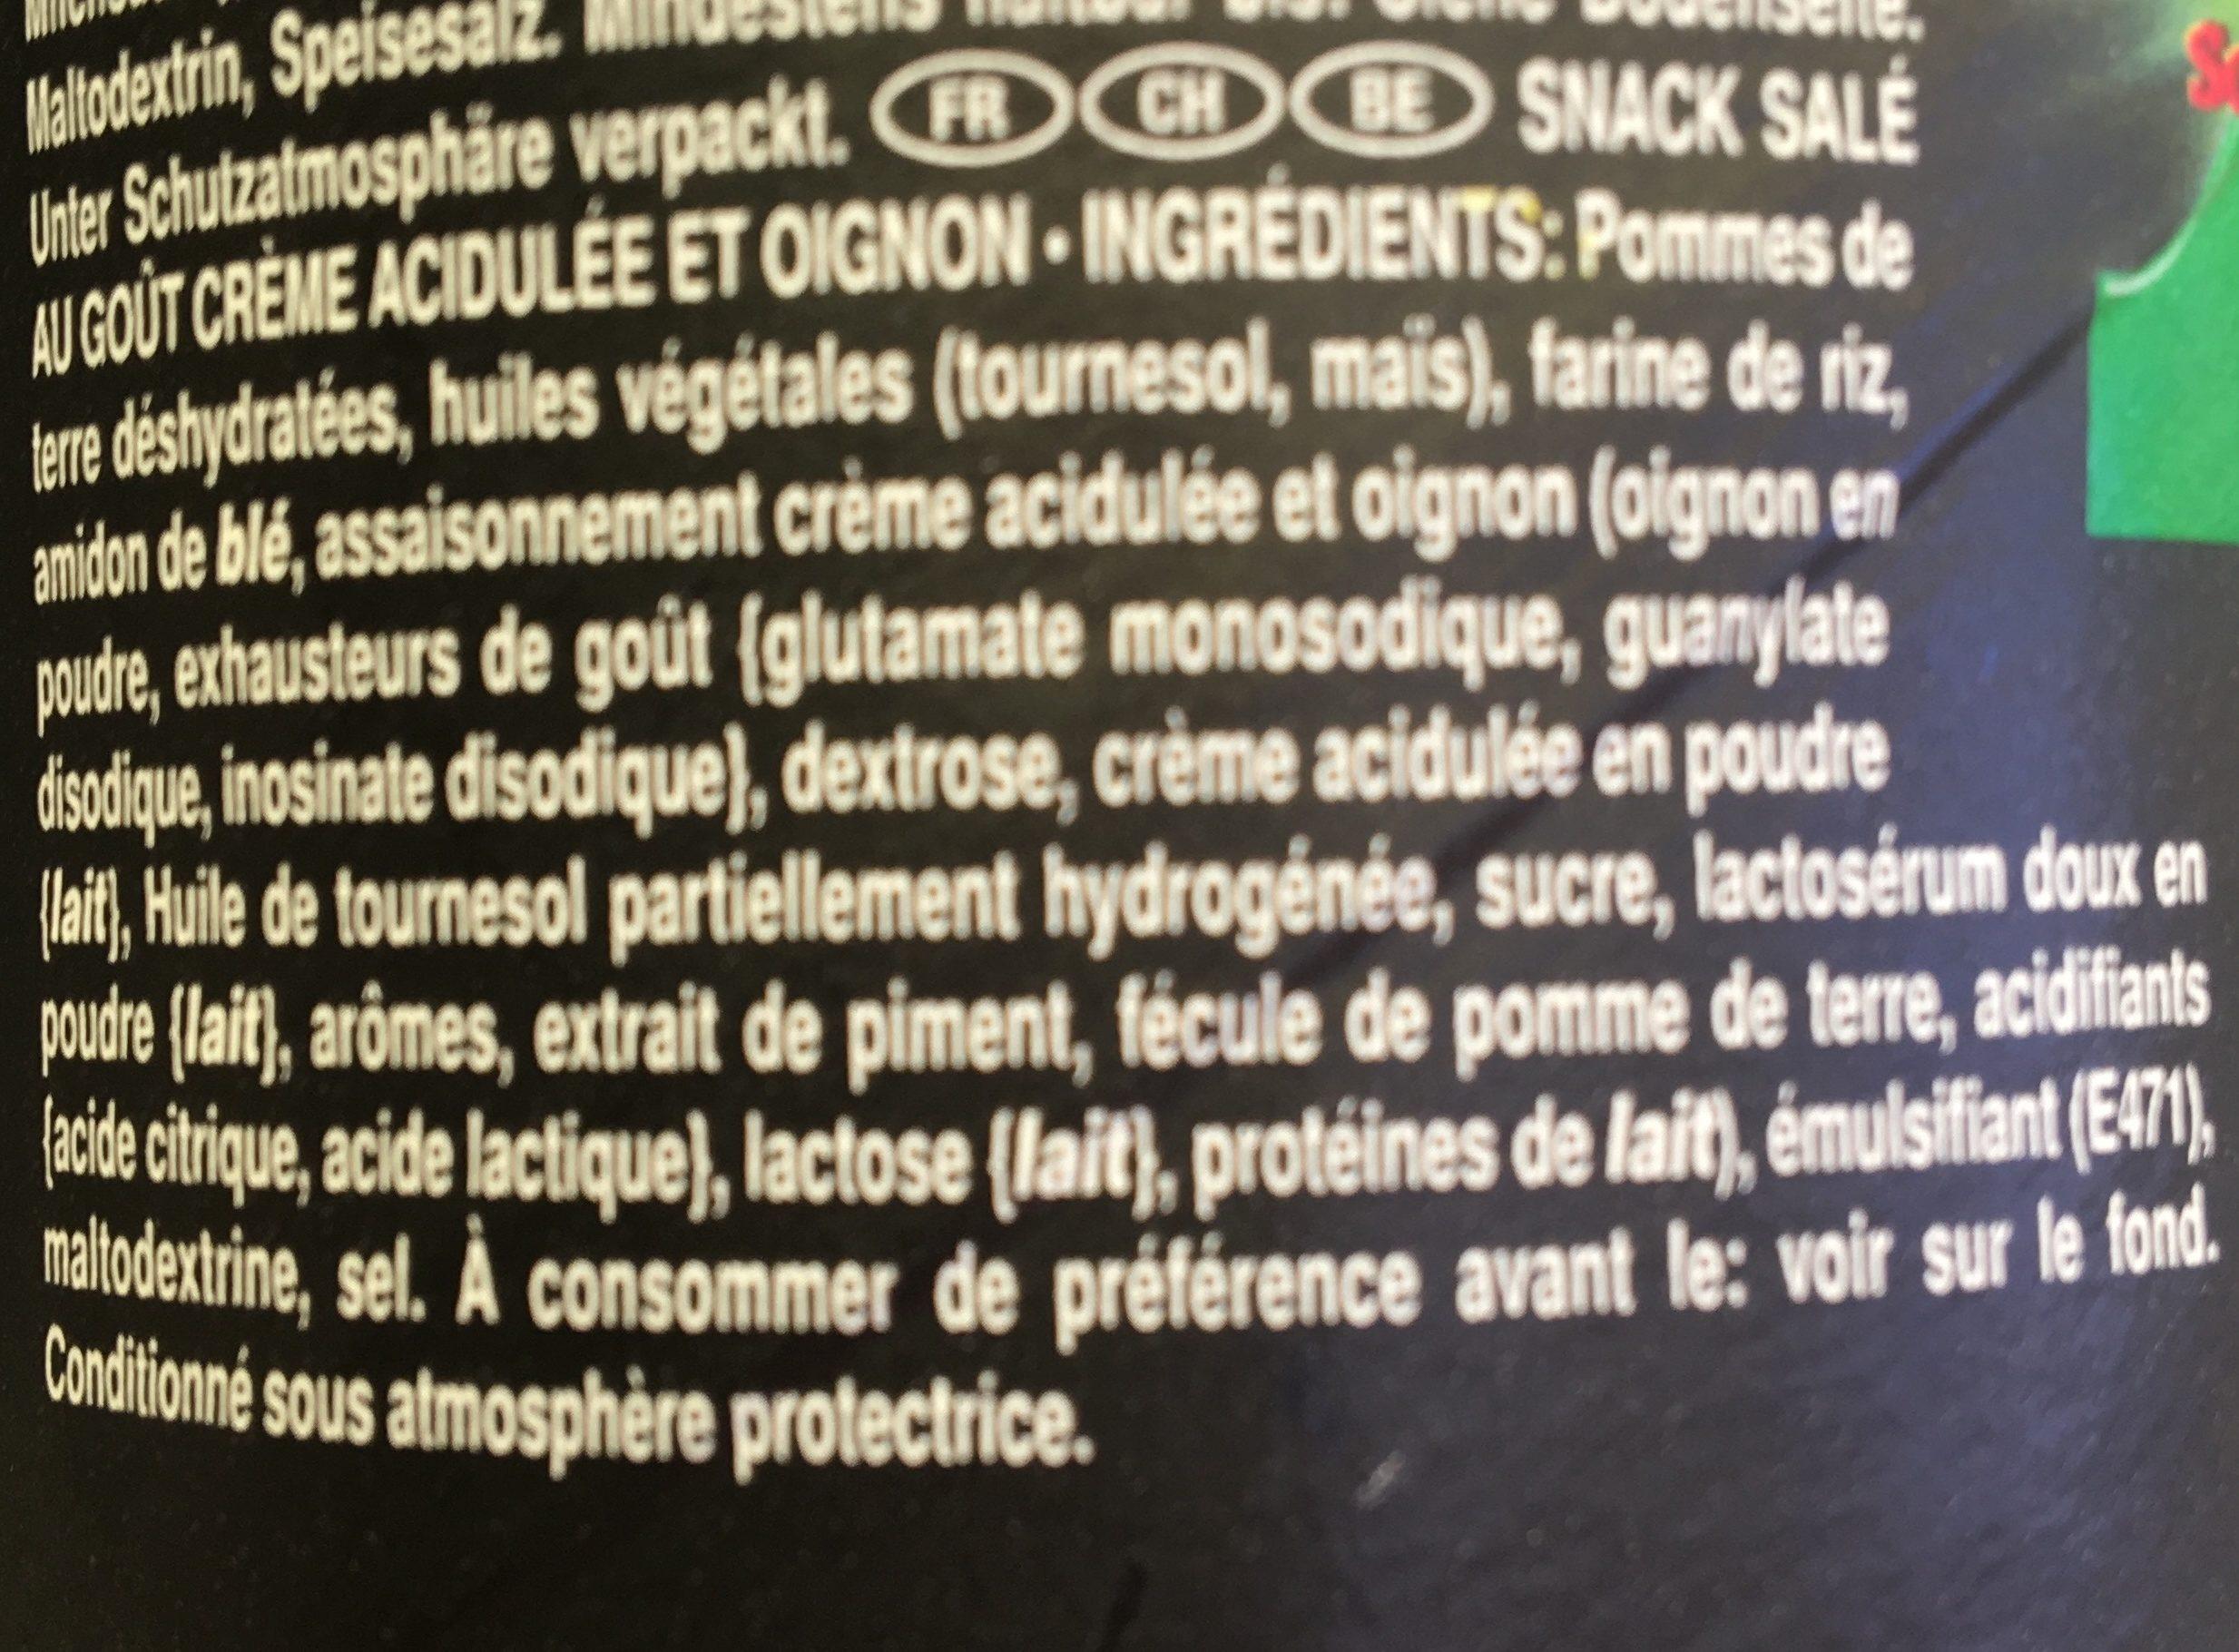 Xtra kickin' sour cream & onion - Ingredients - fr